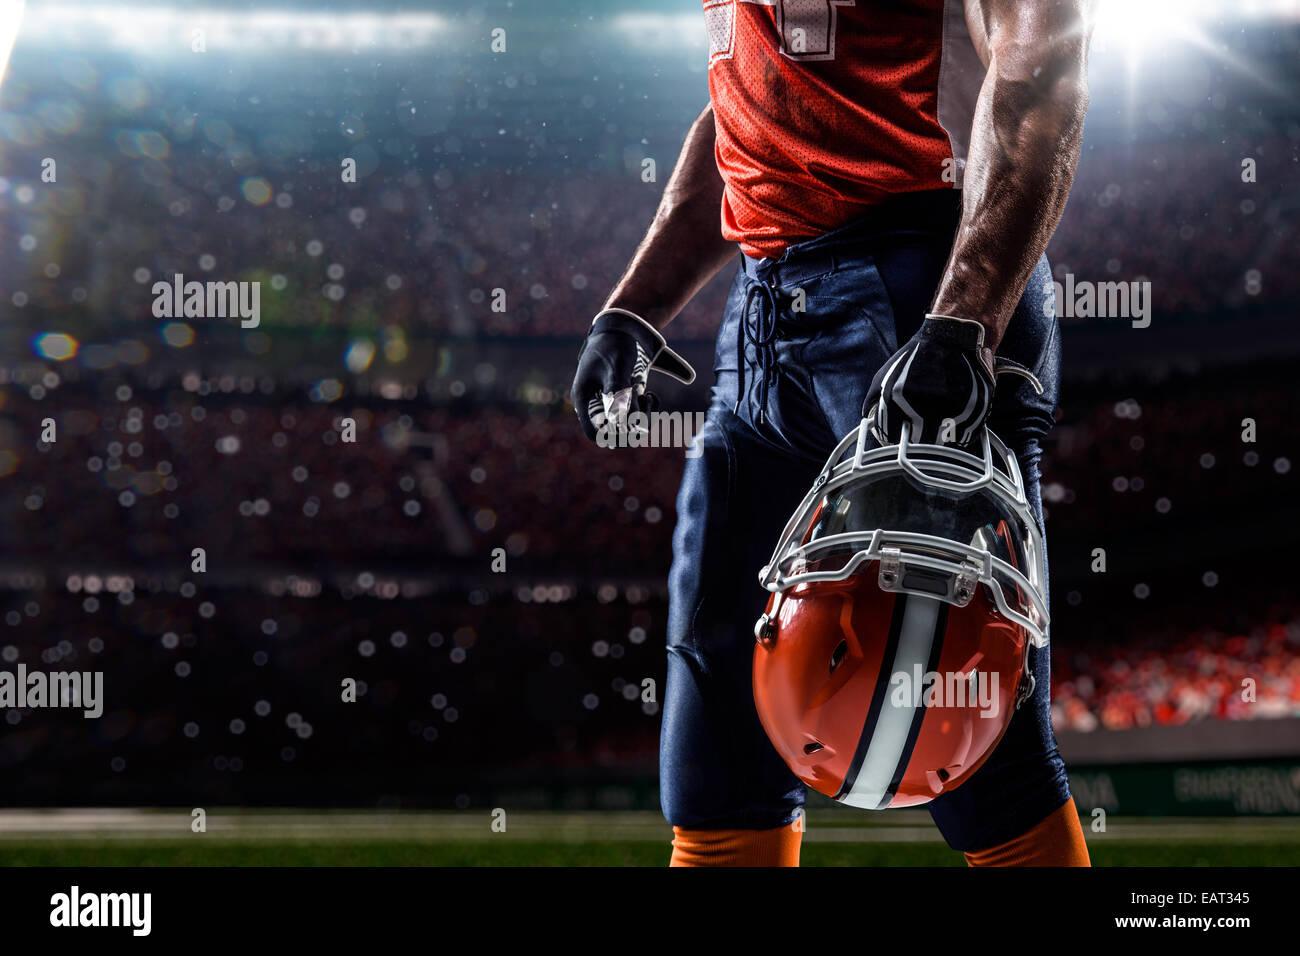 Joueur de football américain au stade olympique sportif Photo Stock